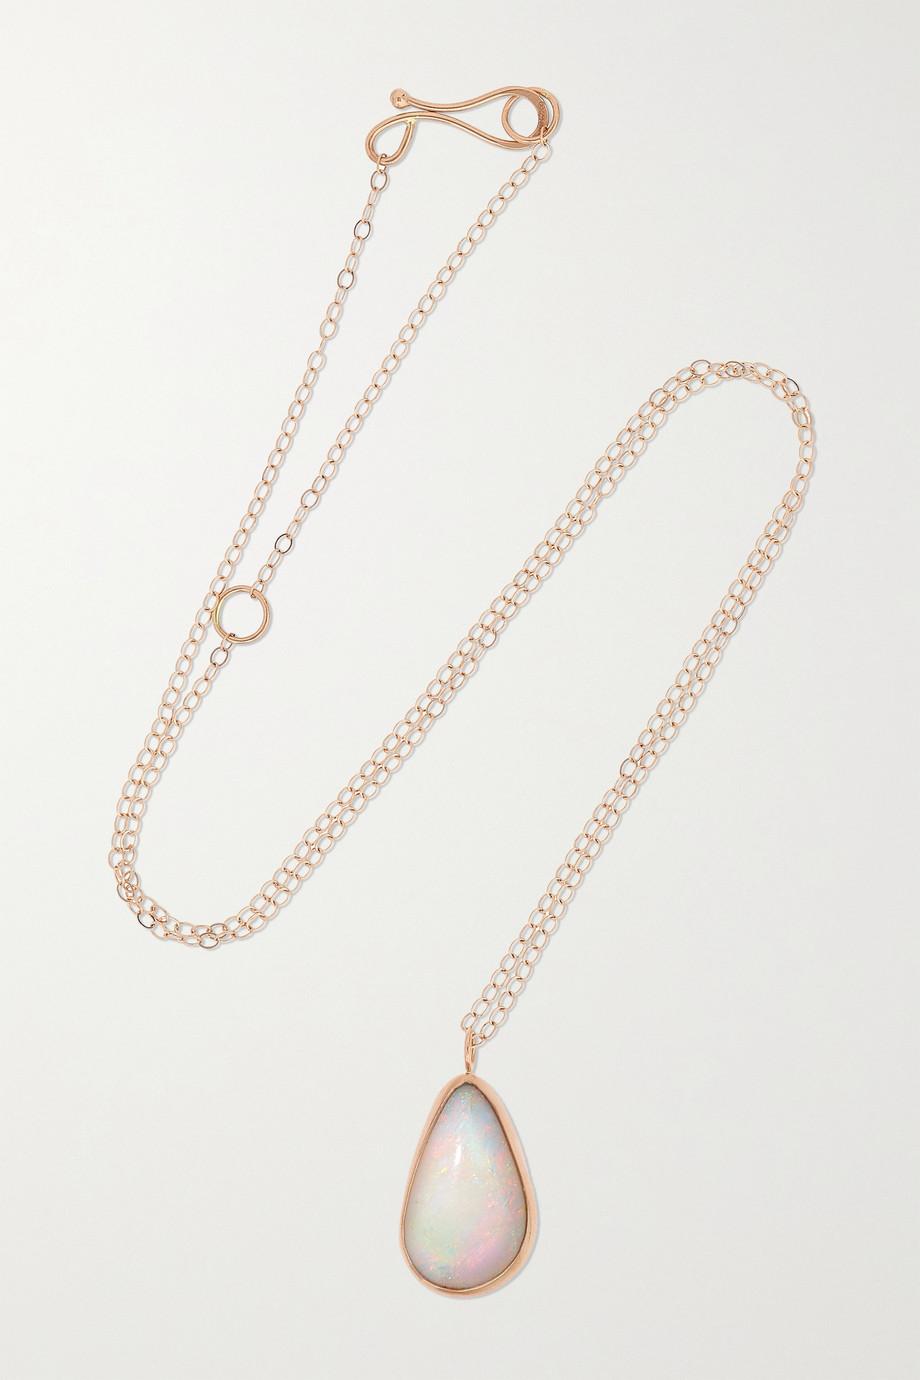 Melissa Joy Manning 14-karat recycled rose gold opal necklace